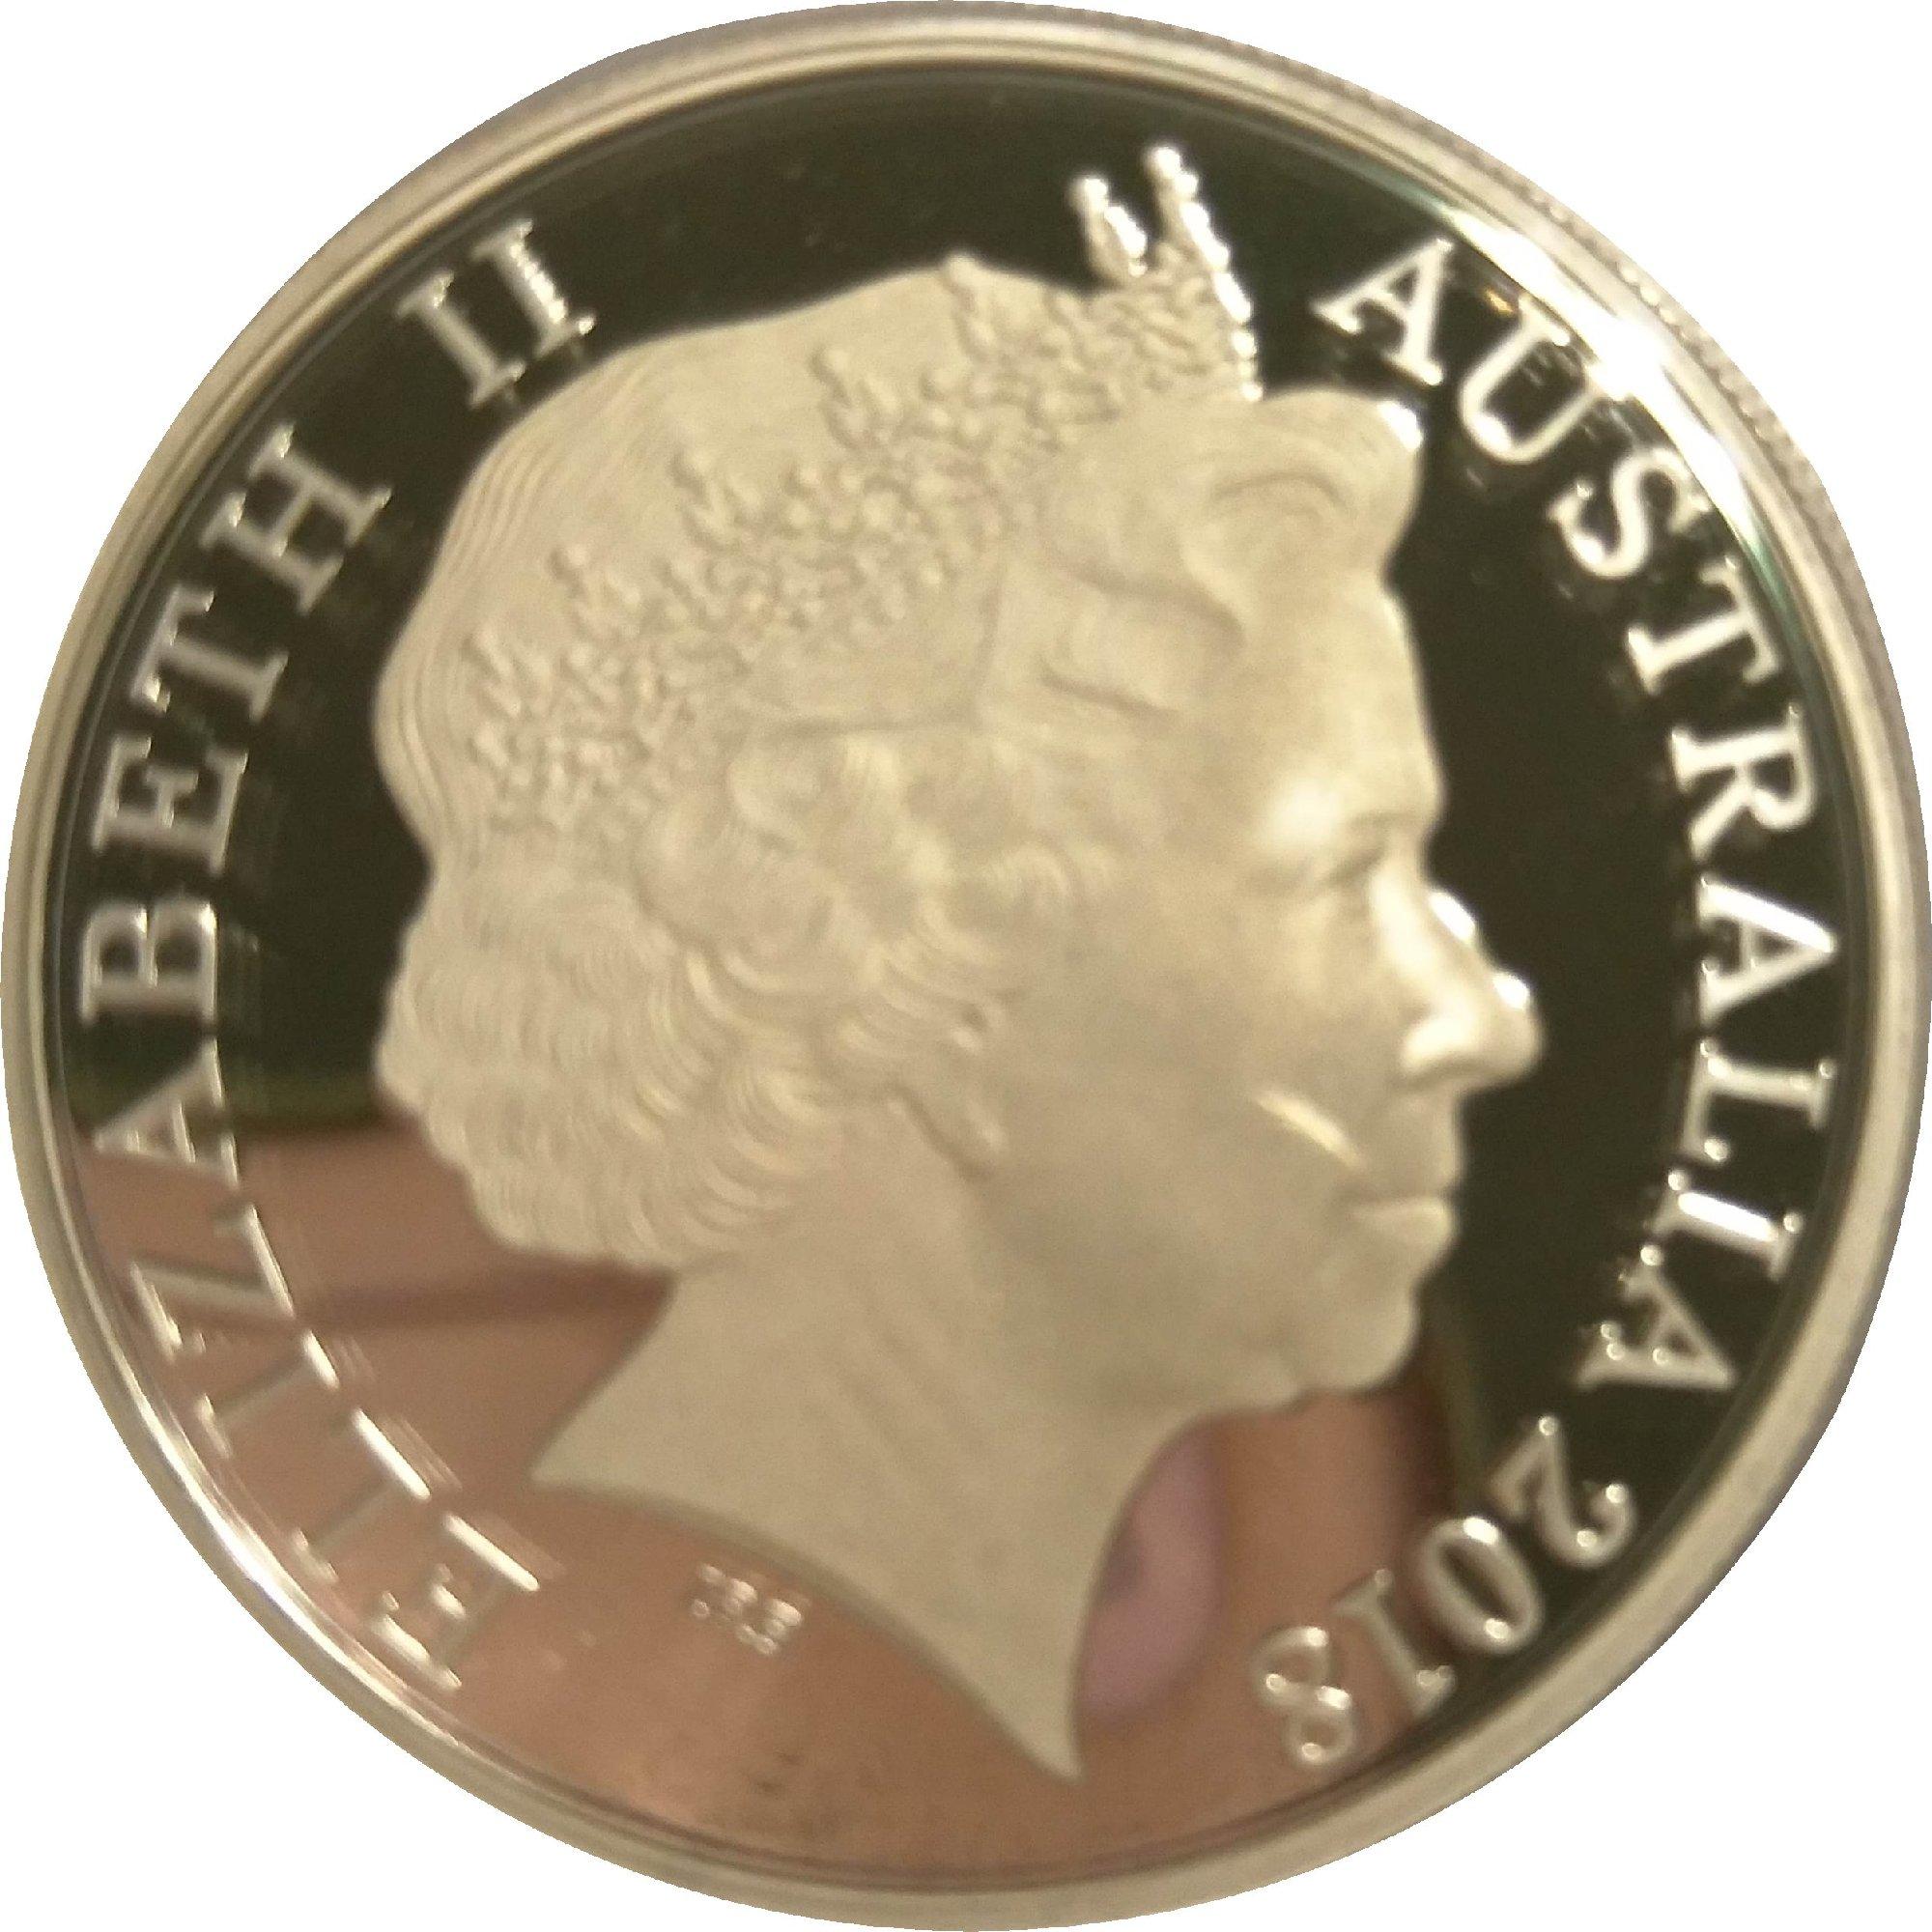 Silver Dollar Dragon 1 oz .999 Perth Mint Australia Art Bar Coin fiirst release!